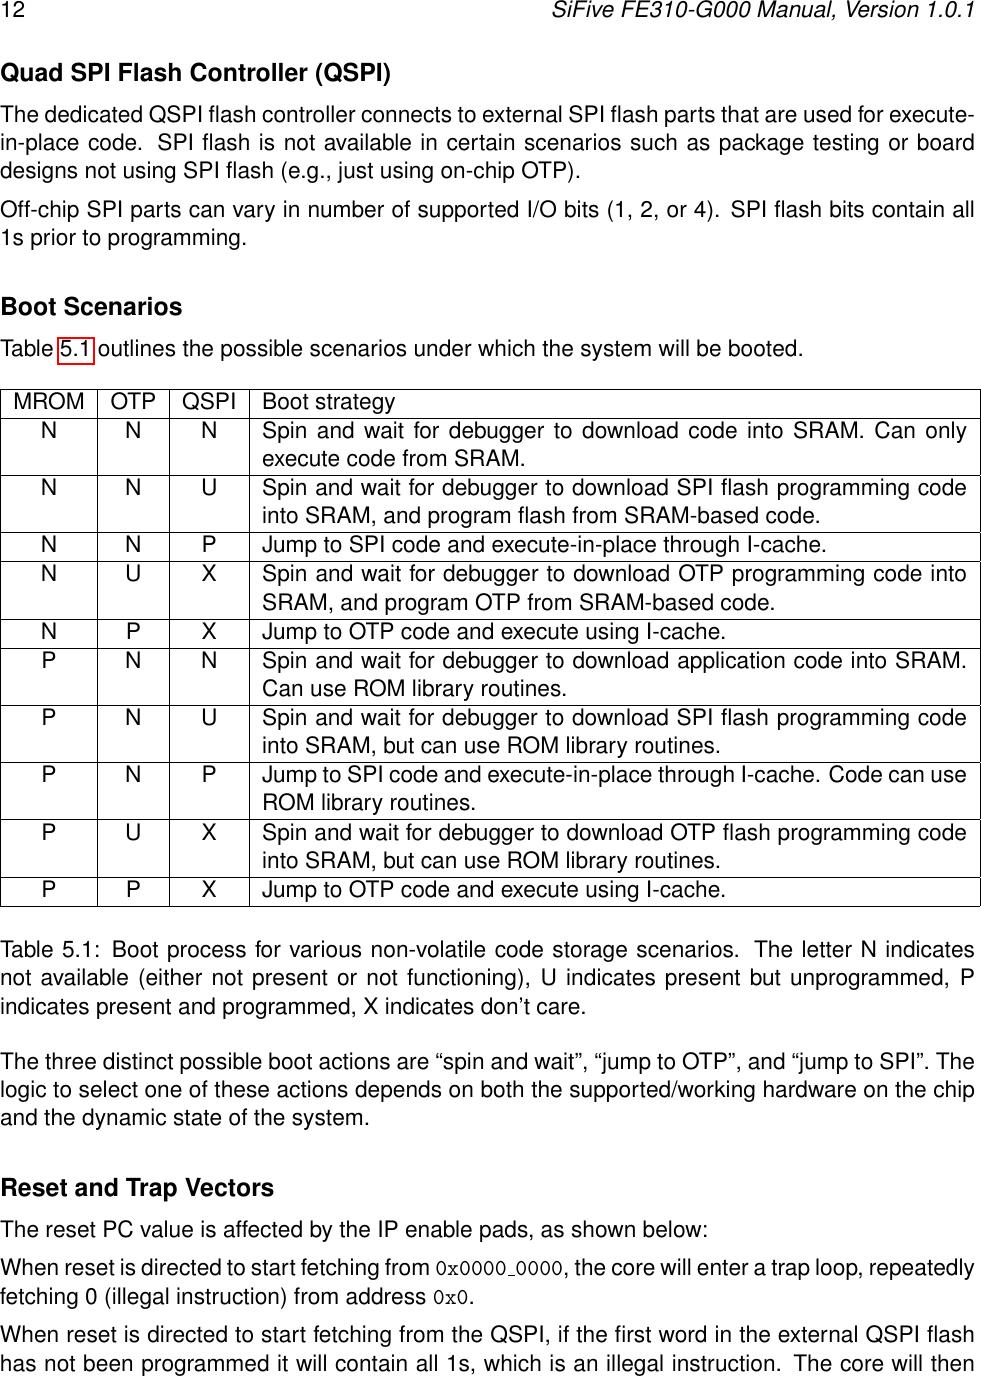 Si Five E310 G000 manual v1 0 1